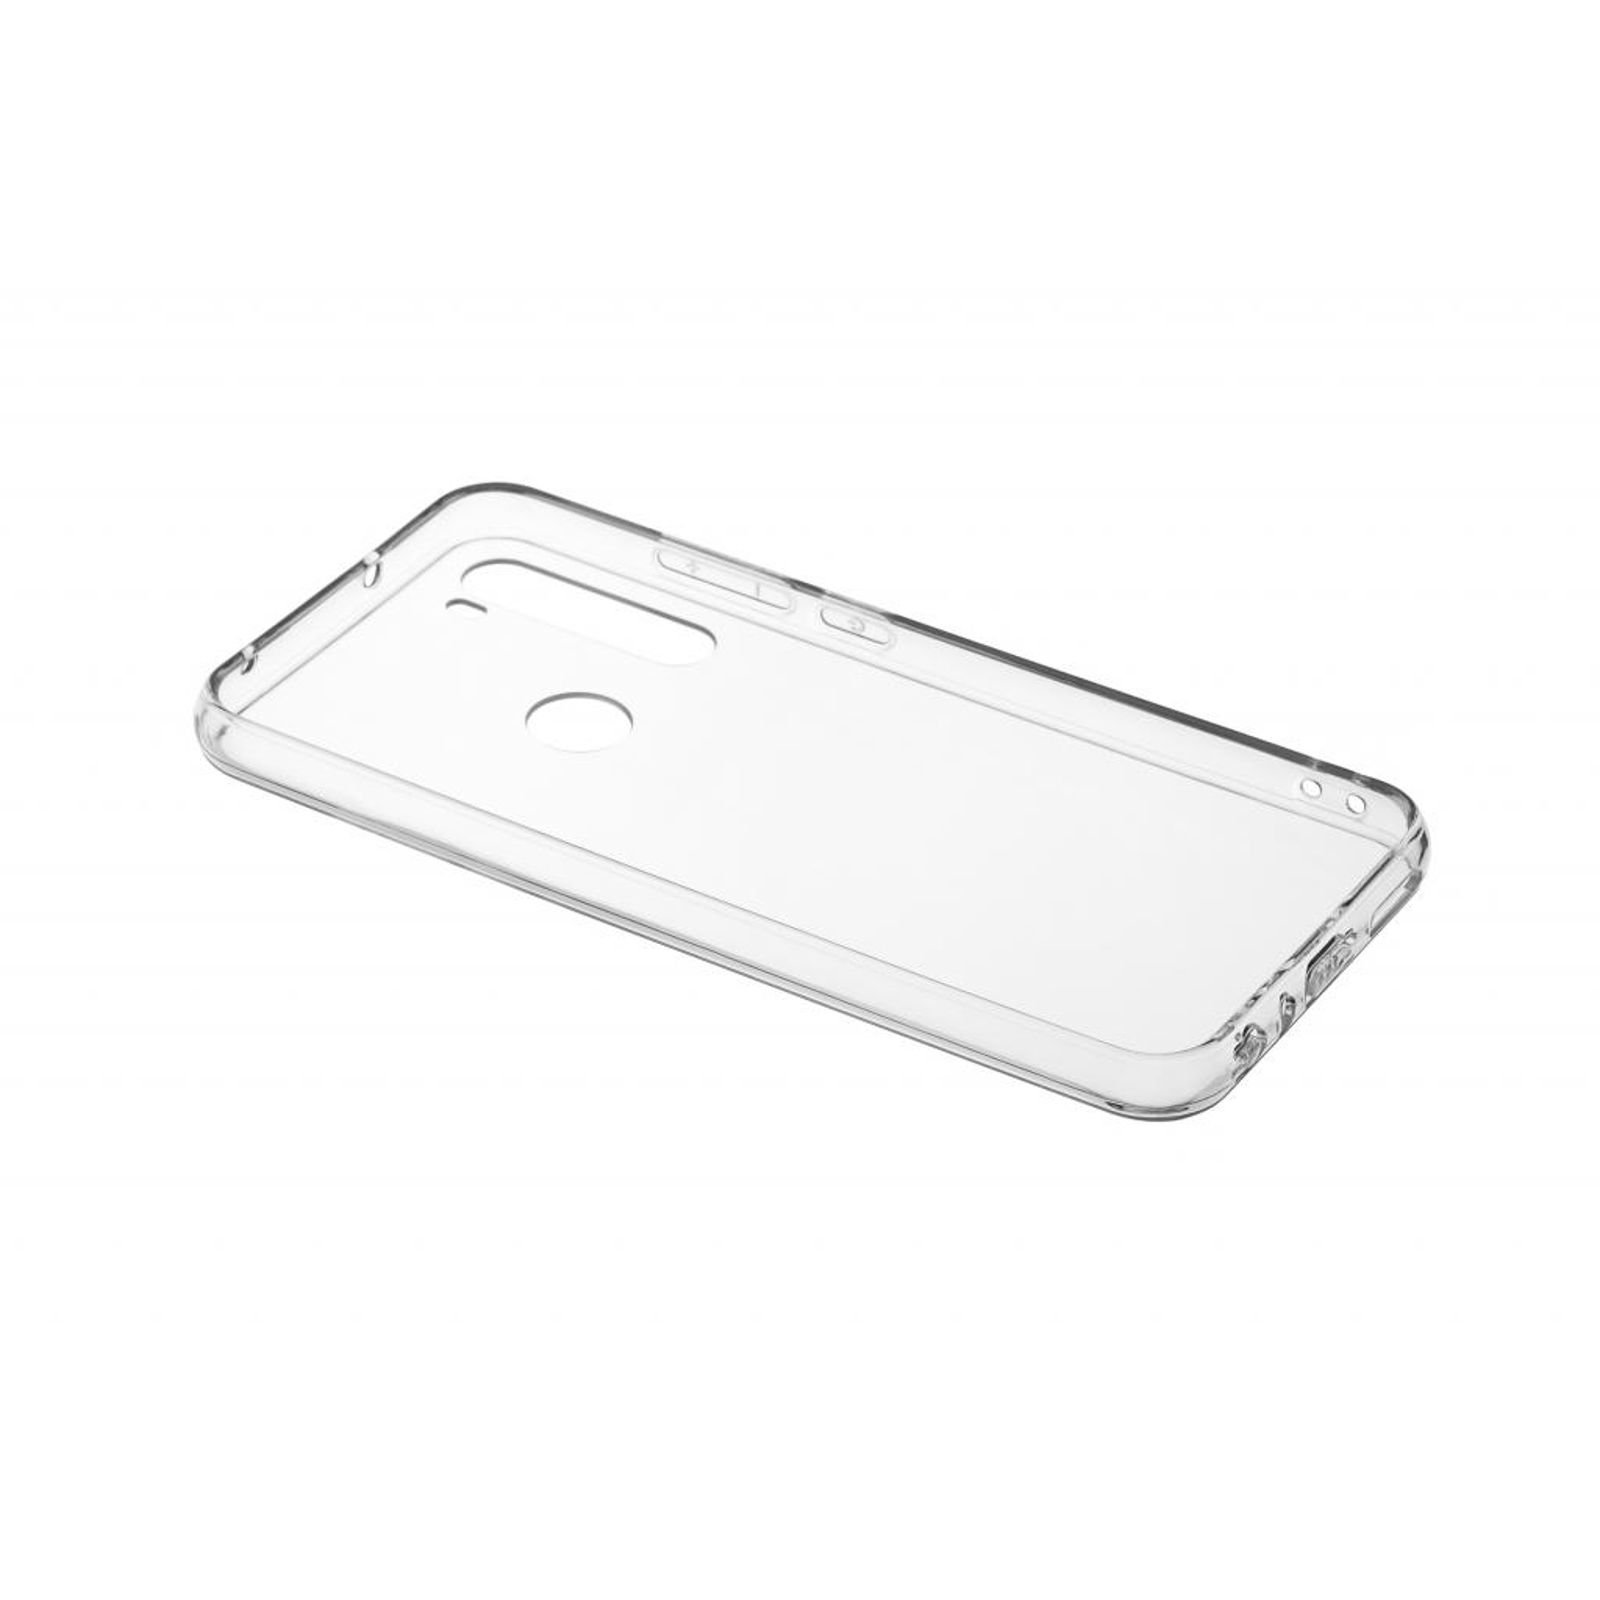 Чехол для моб. телефона 2E Xiaomi Redmi Note 8, Hybrid, Transparent (2E-MI-N8-AOHB-TR) изображение 2